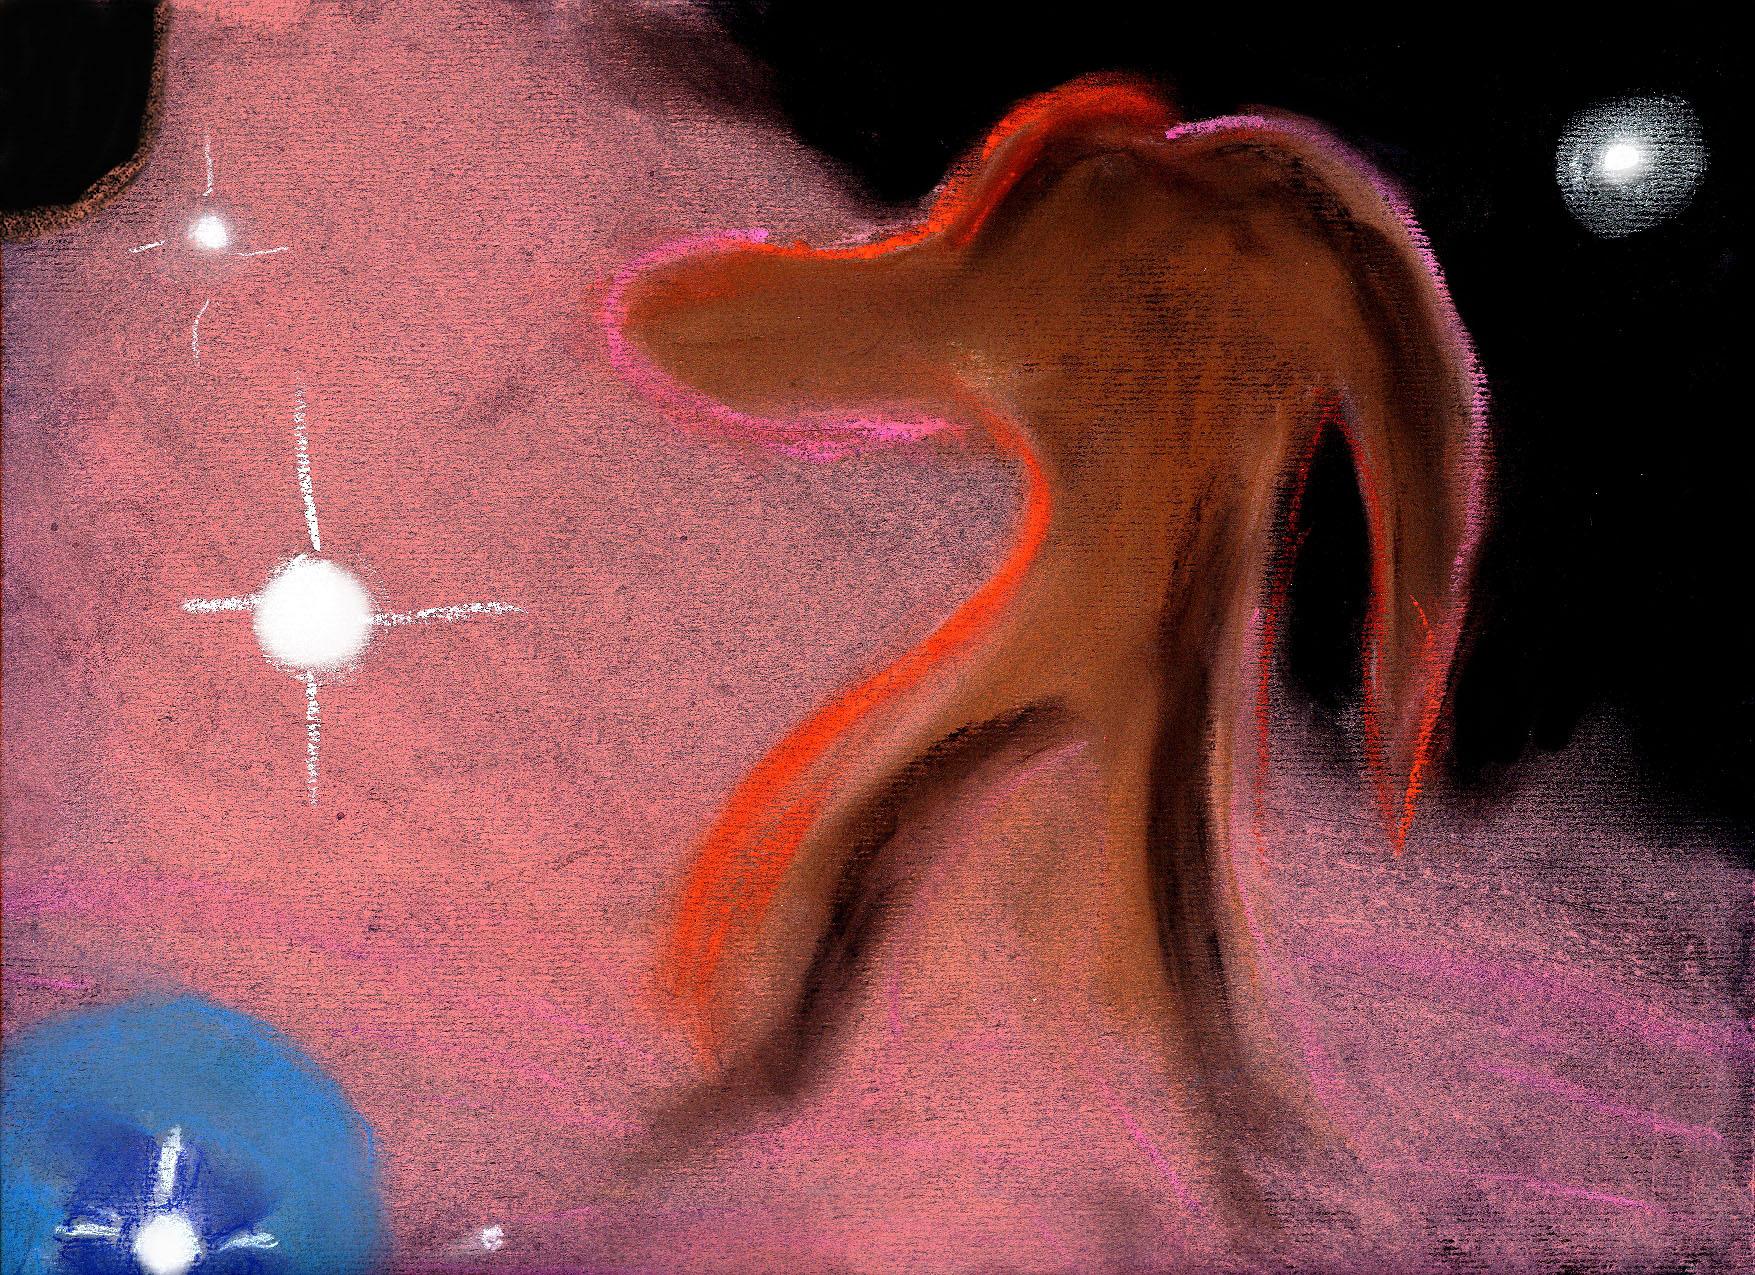 atlas horsehead nebula - photo #33